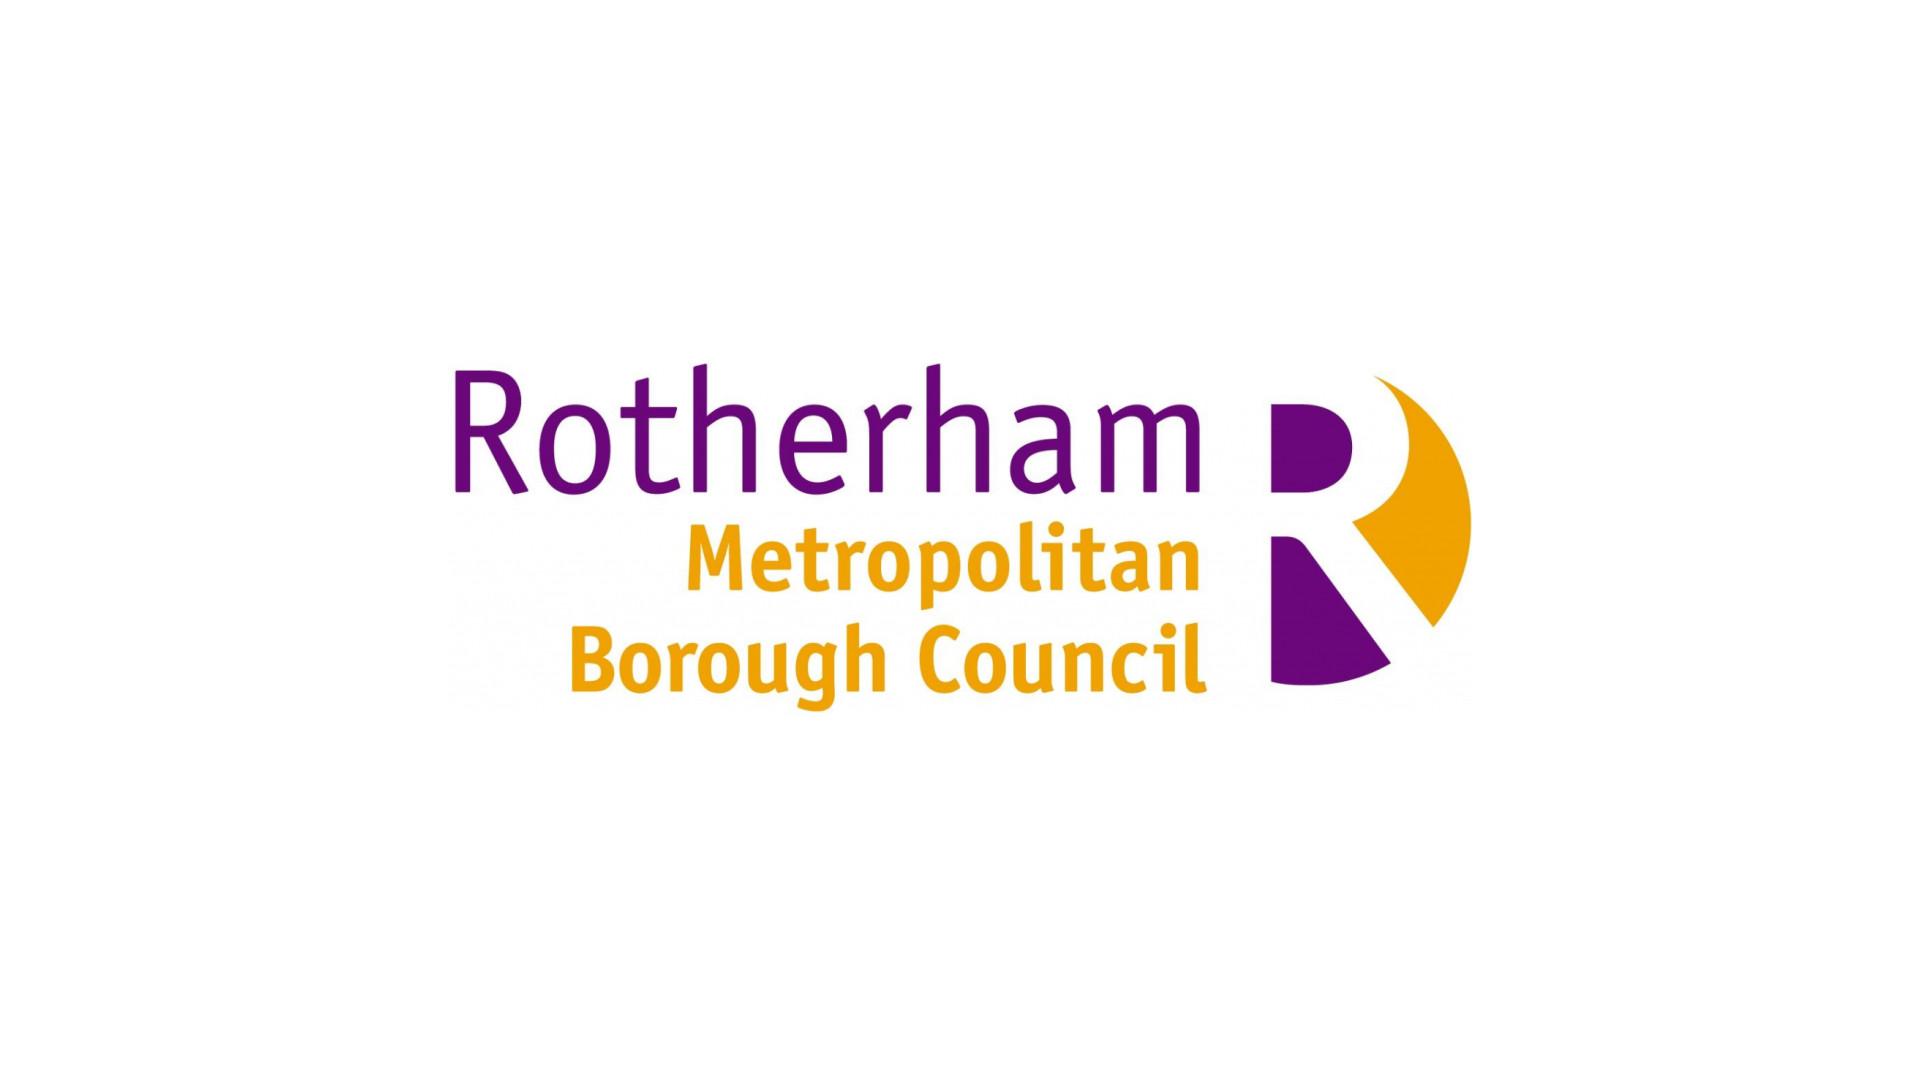 rotherham city council.jpg